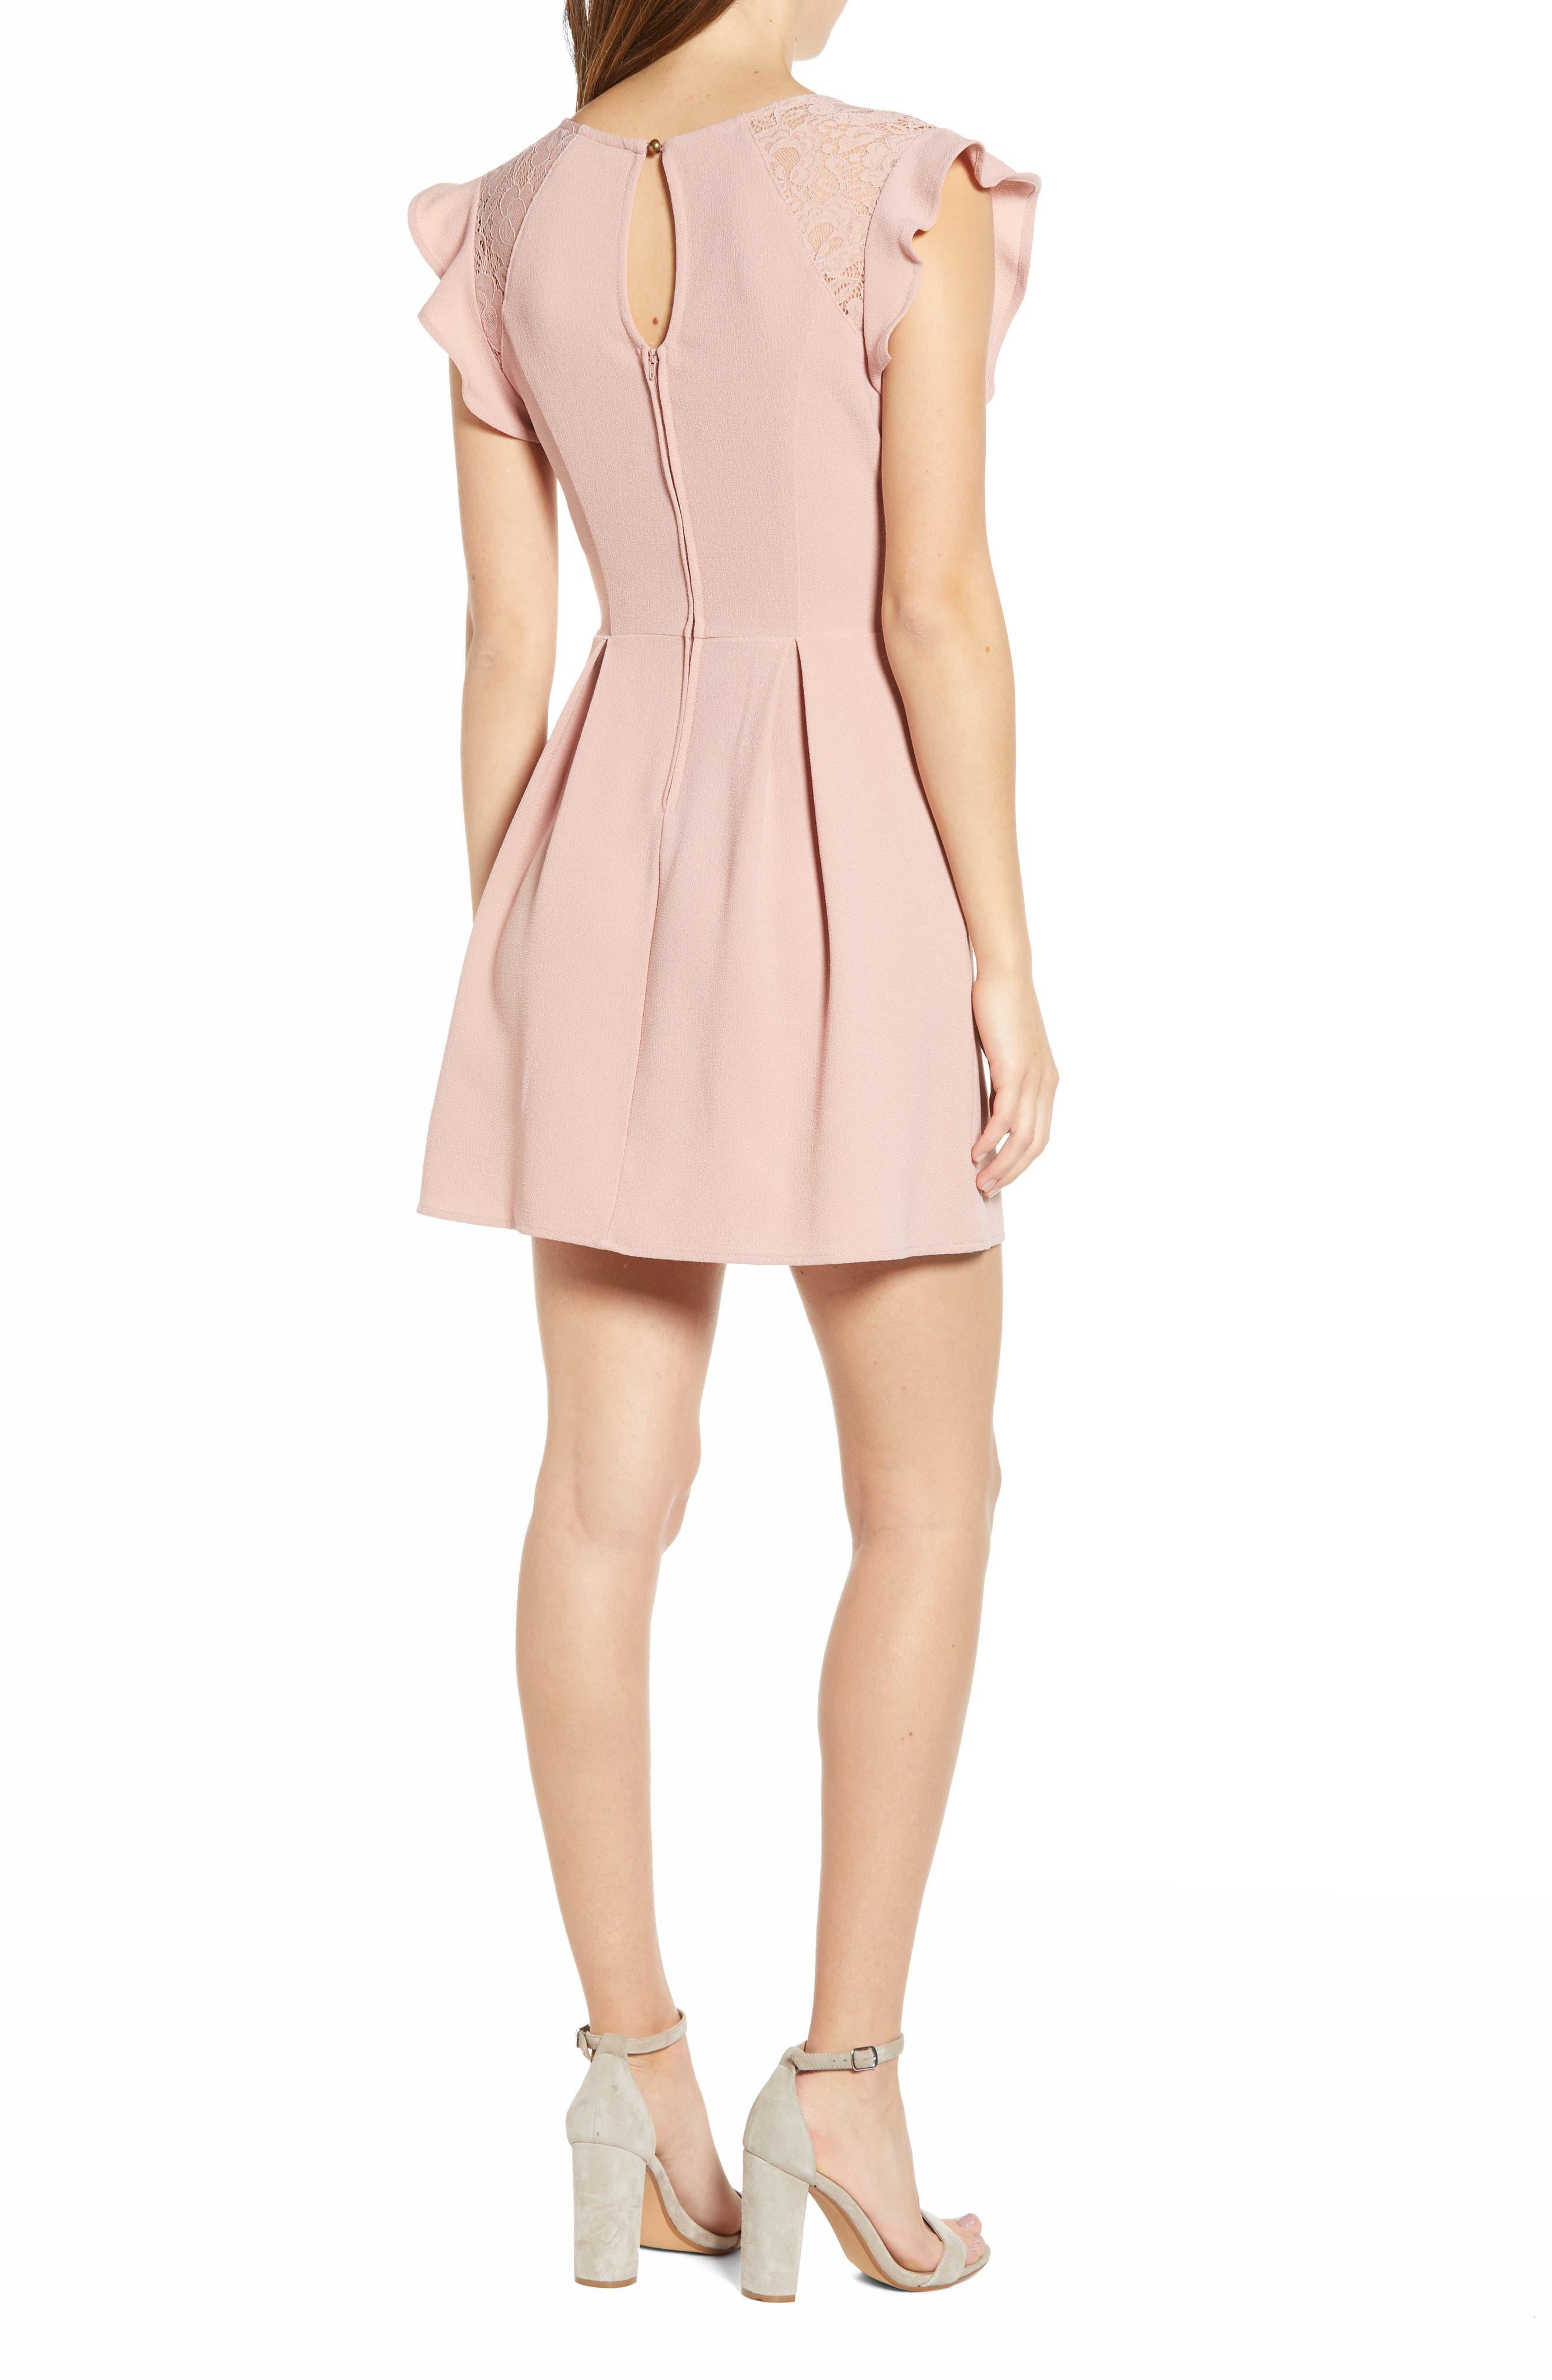 SPEECHLESS,                             Crepe Flutter Sleeve Fit & Flare Dress,                             Alternate thumbnail 2, color,                             ANTIQUE ROSE